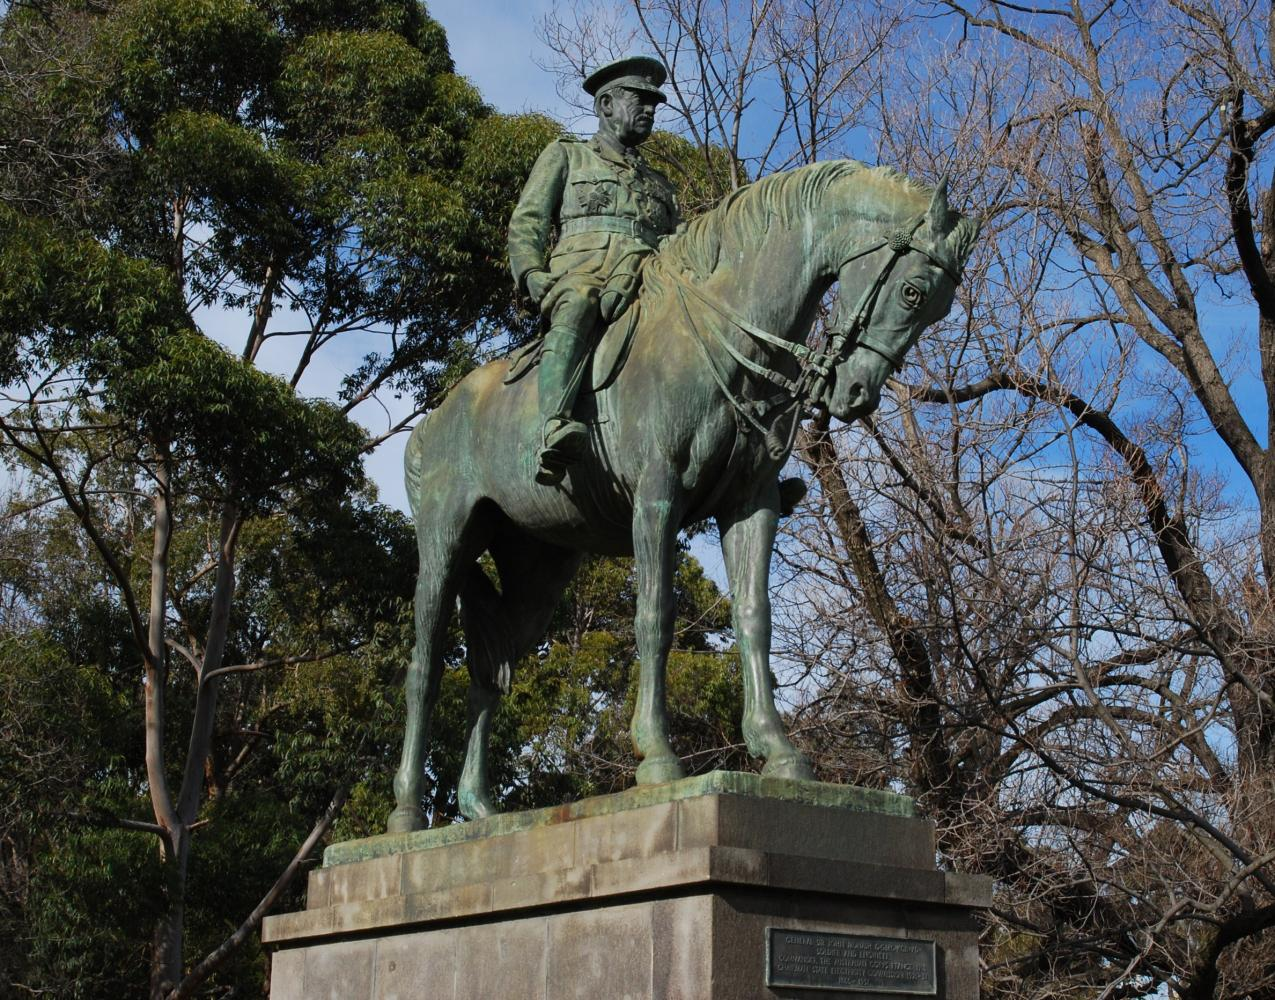 Monument to Sir General John Monash